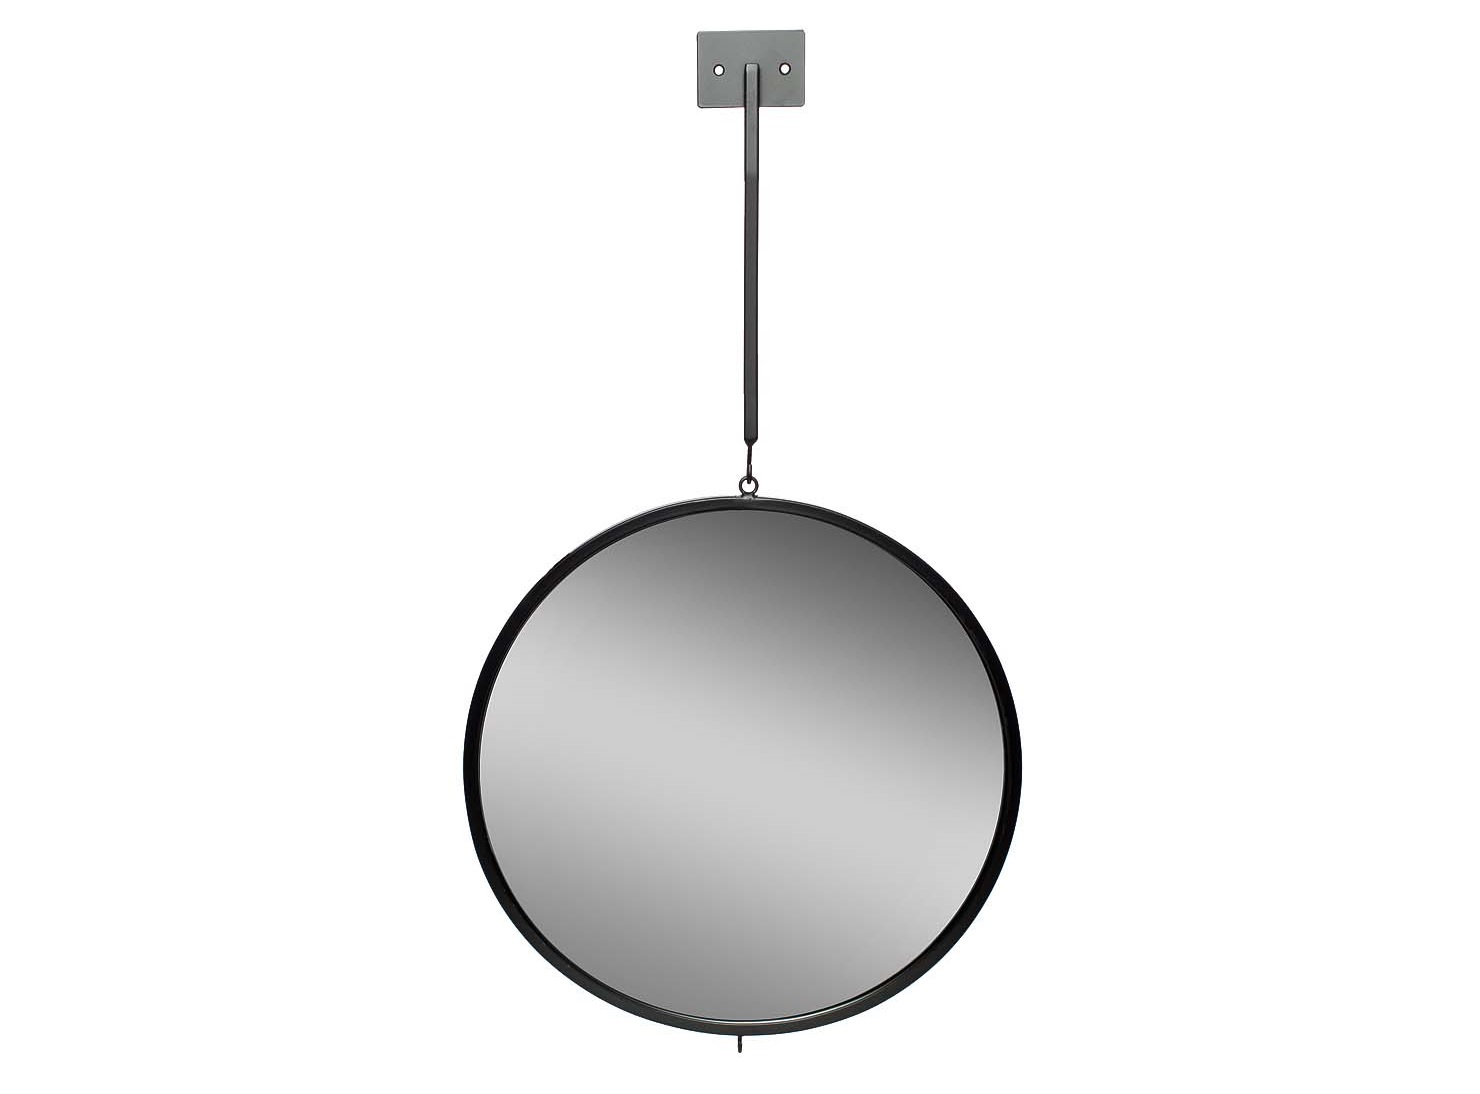 ЗеркалоНастенные зеркала<br>высота планки - 30 см<br><br>Material: Металл<br>Ширина см: 40<br>Высота см: 70